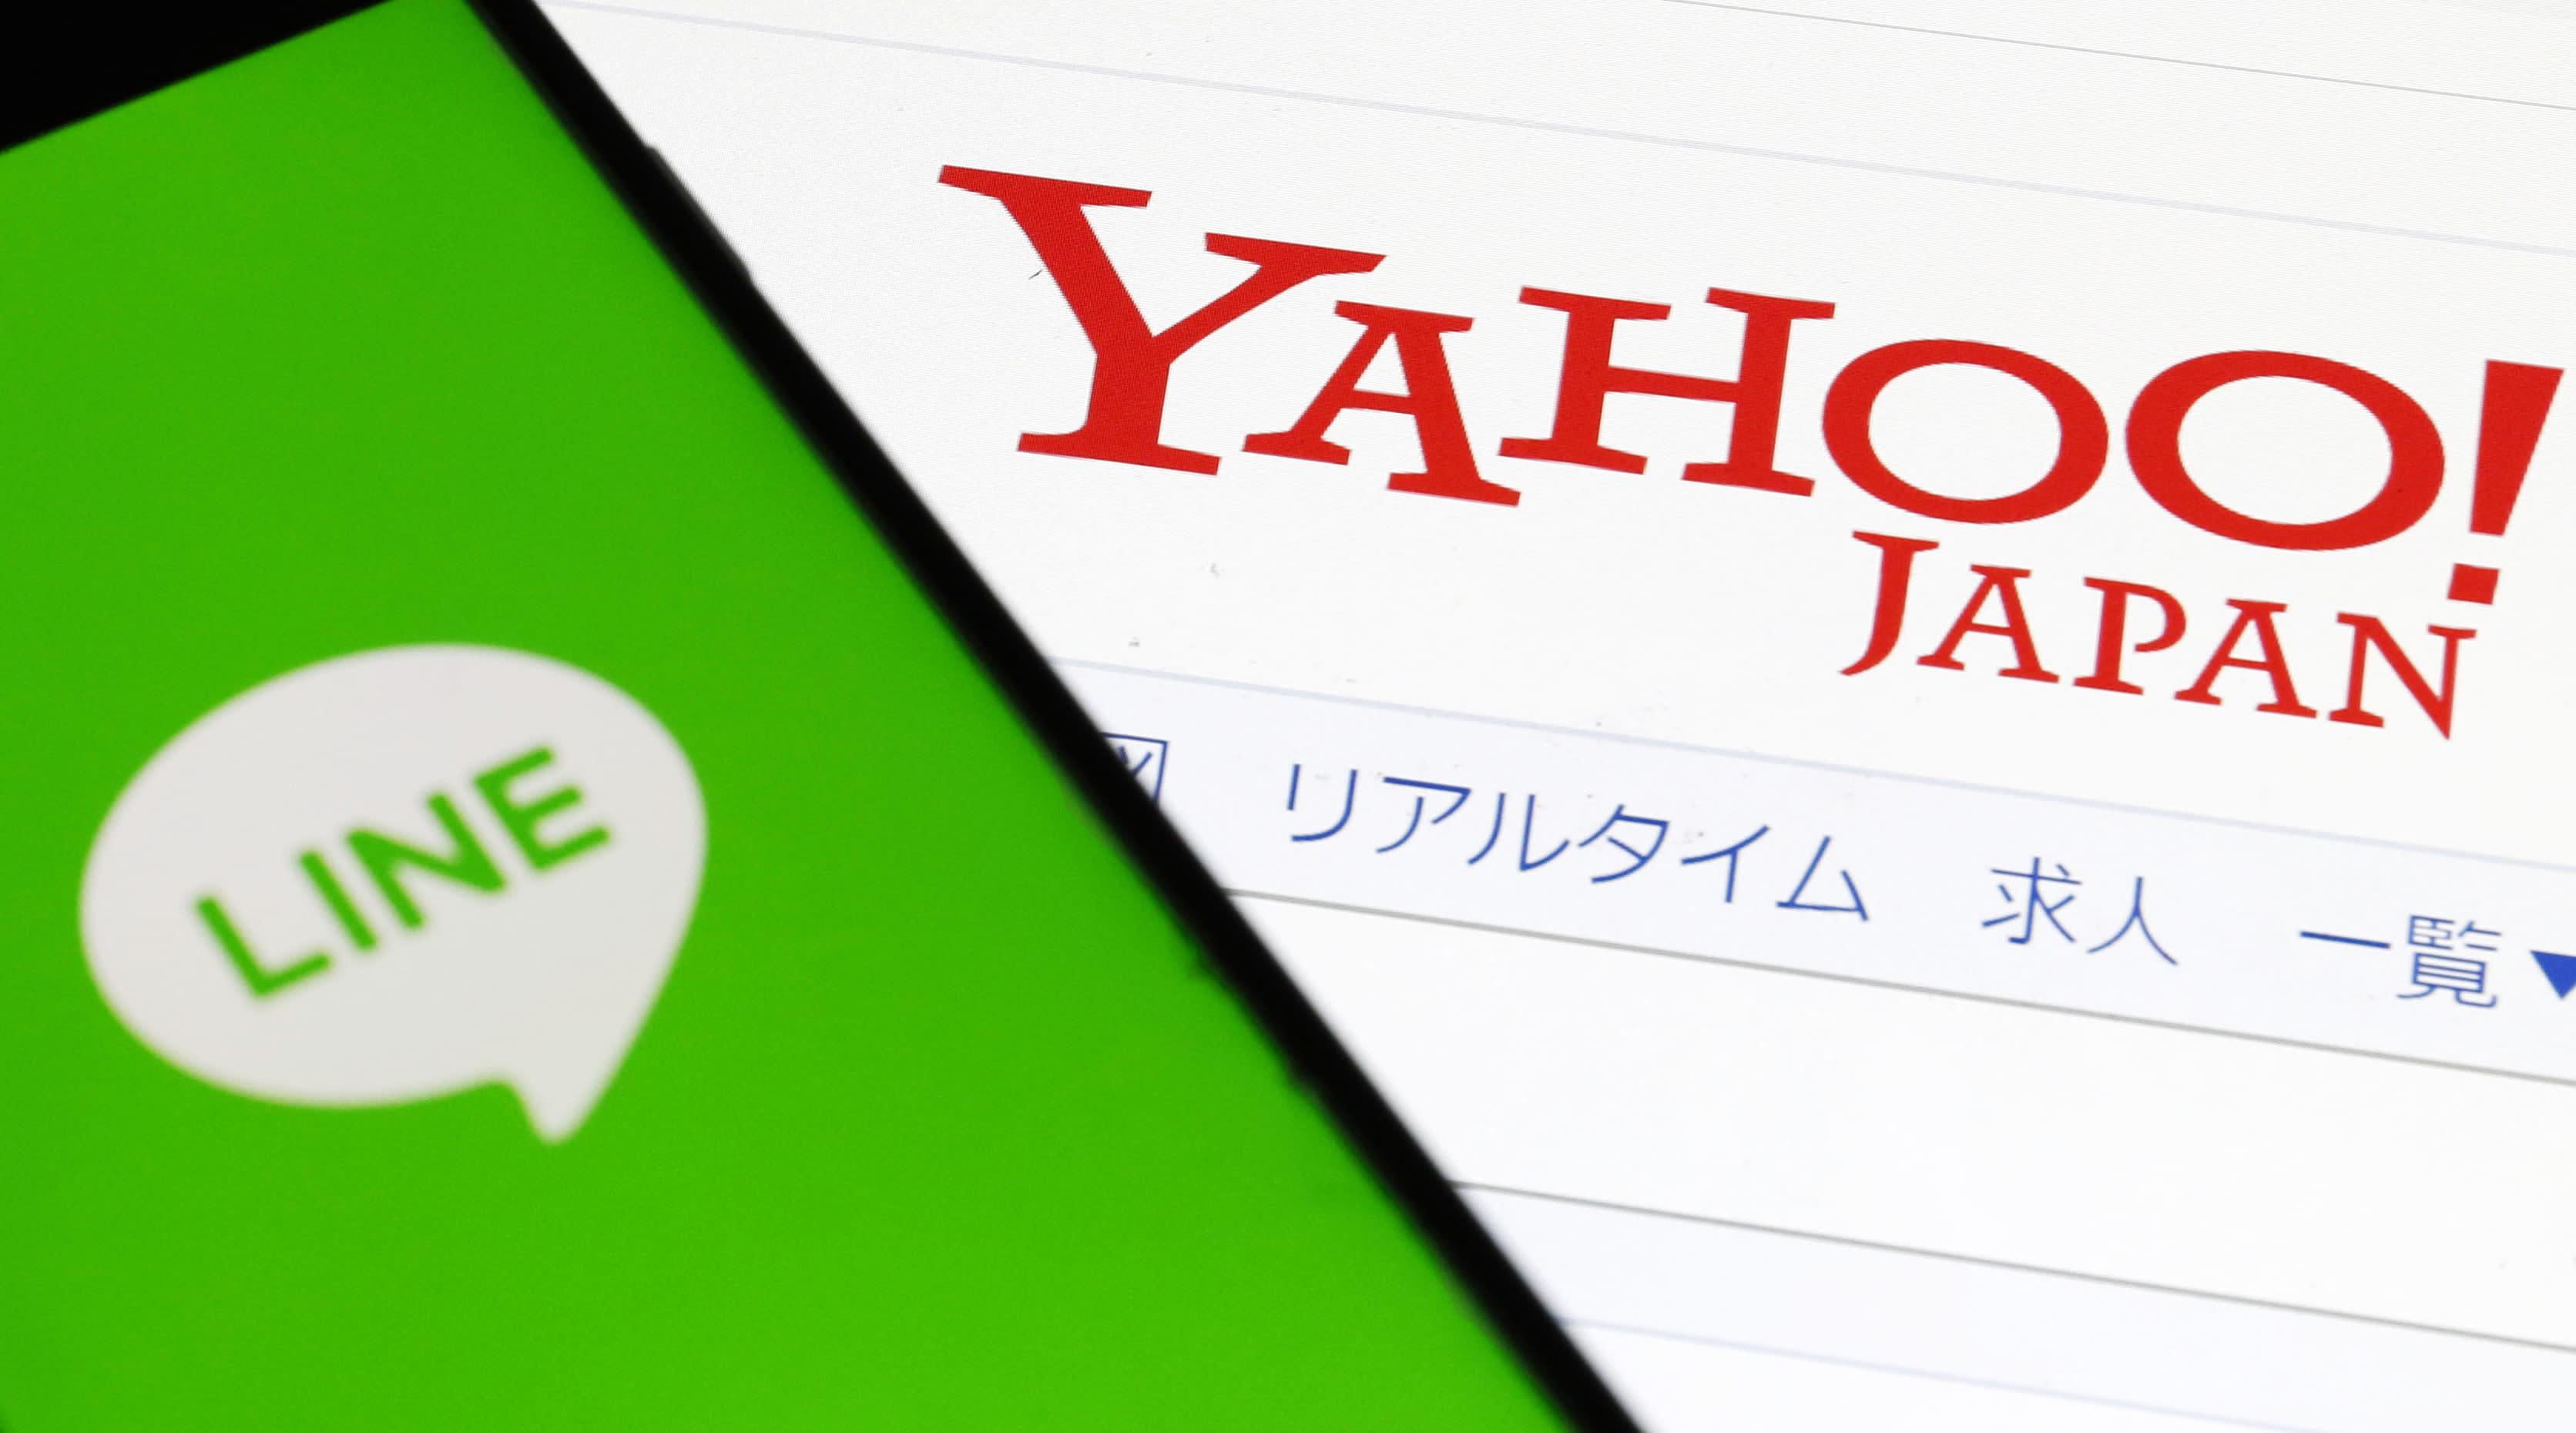 Japan Yahoo Line